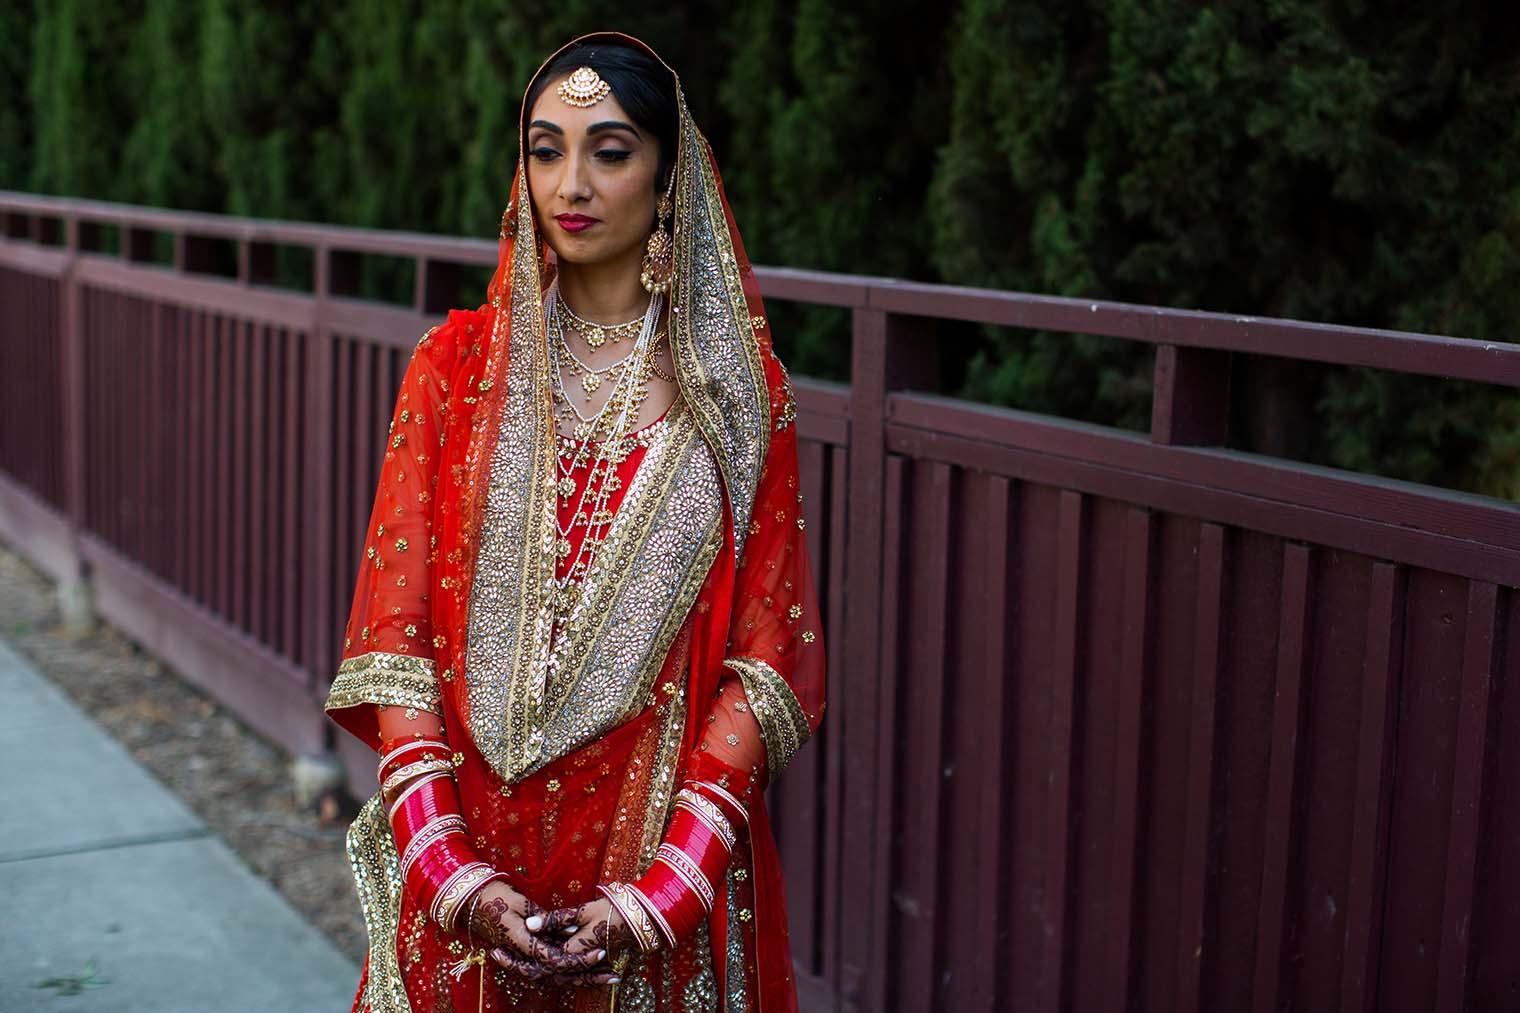 Indian Bride Portrait by San Mateo Wedding Photographer